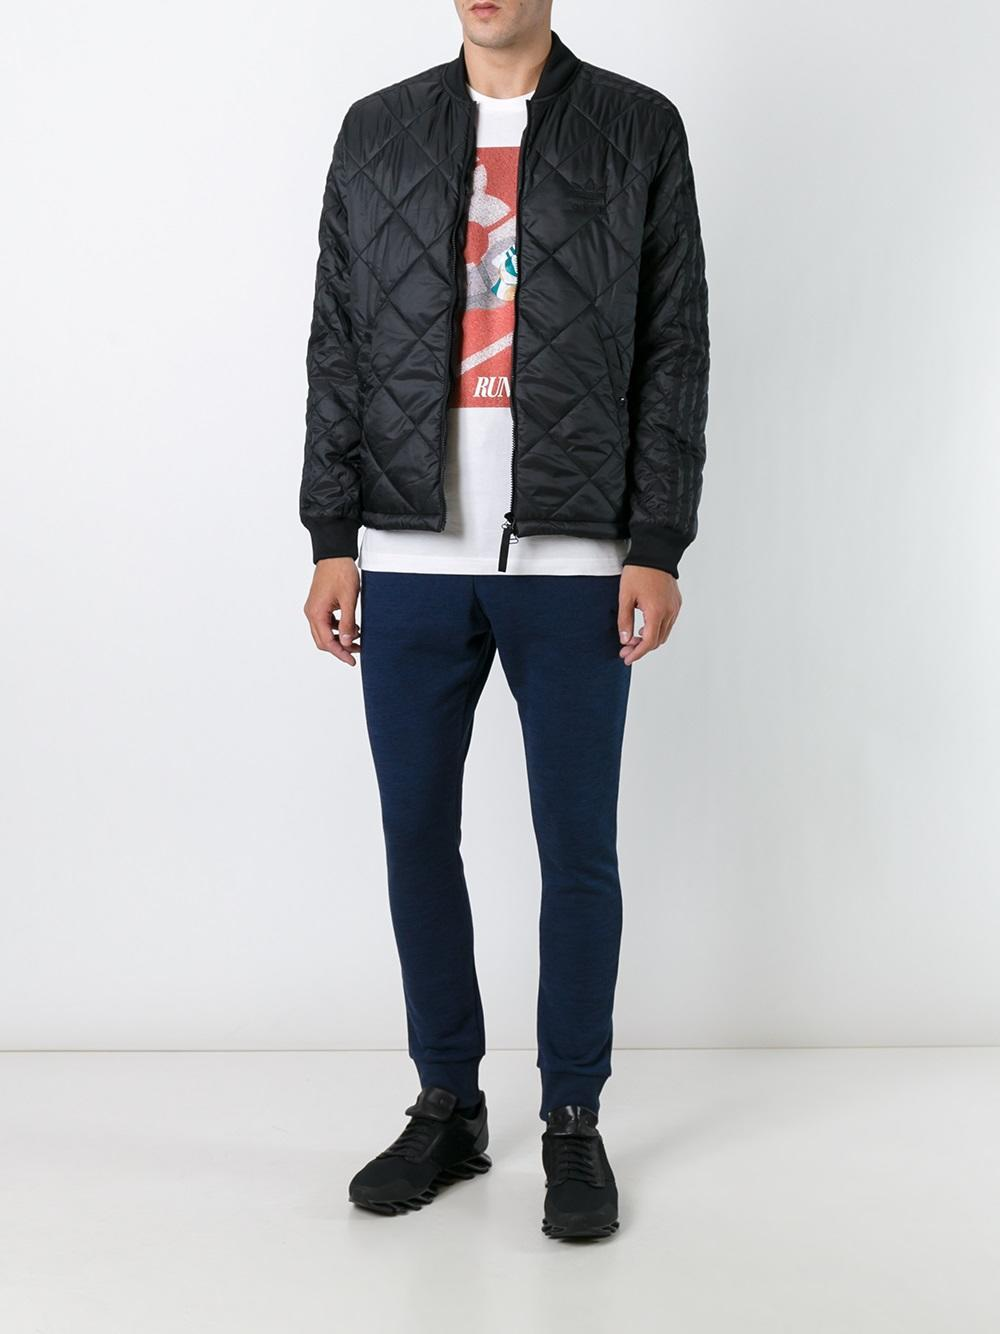 Adidas Originals Quilted Superstar Bomber Jacket In